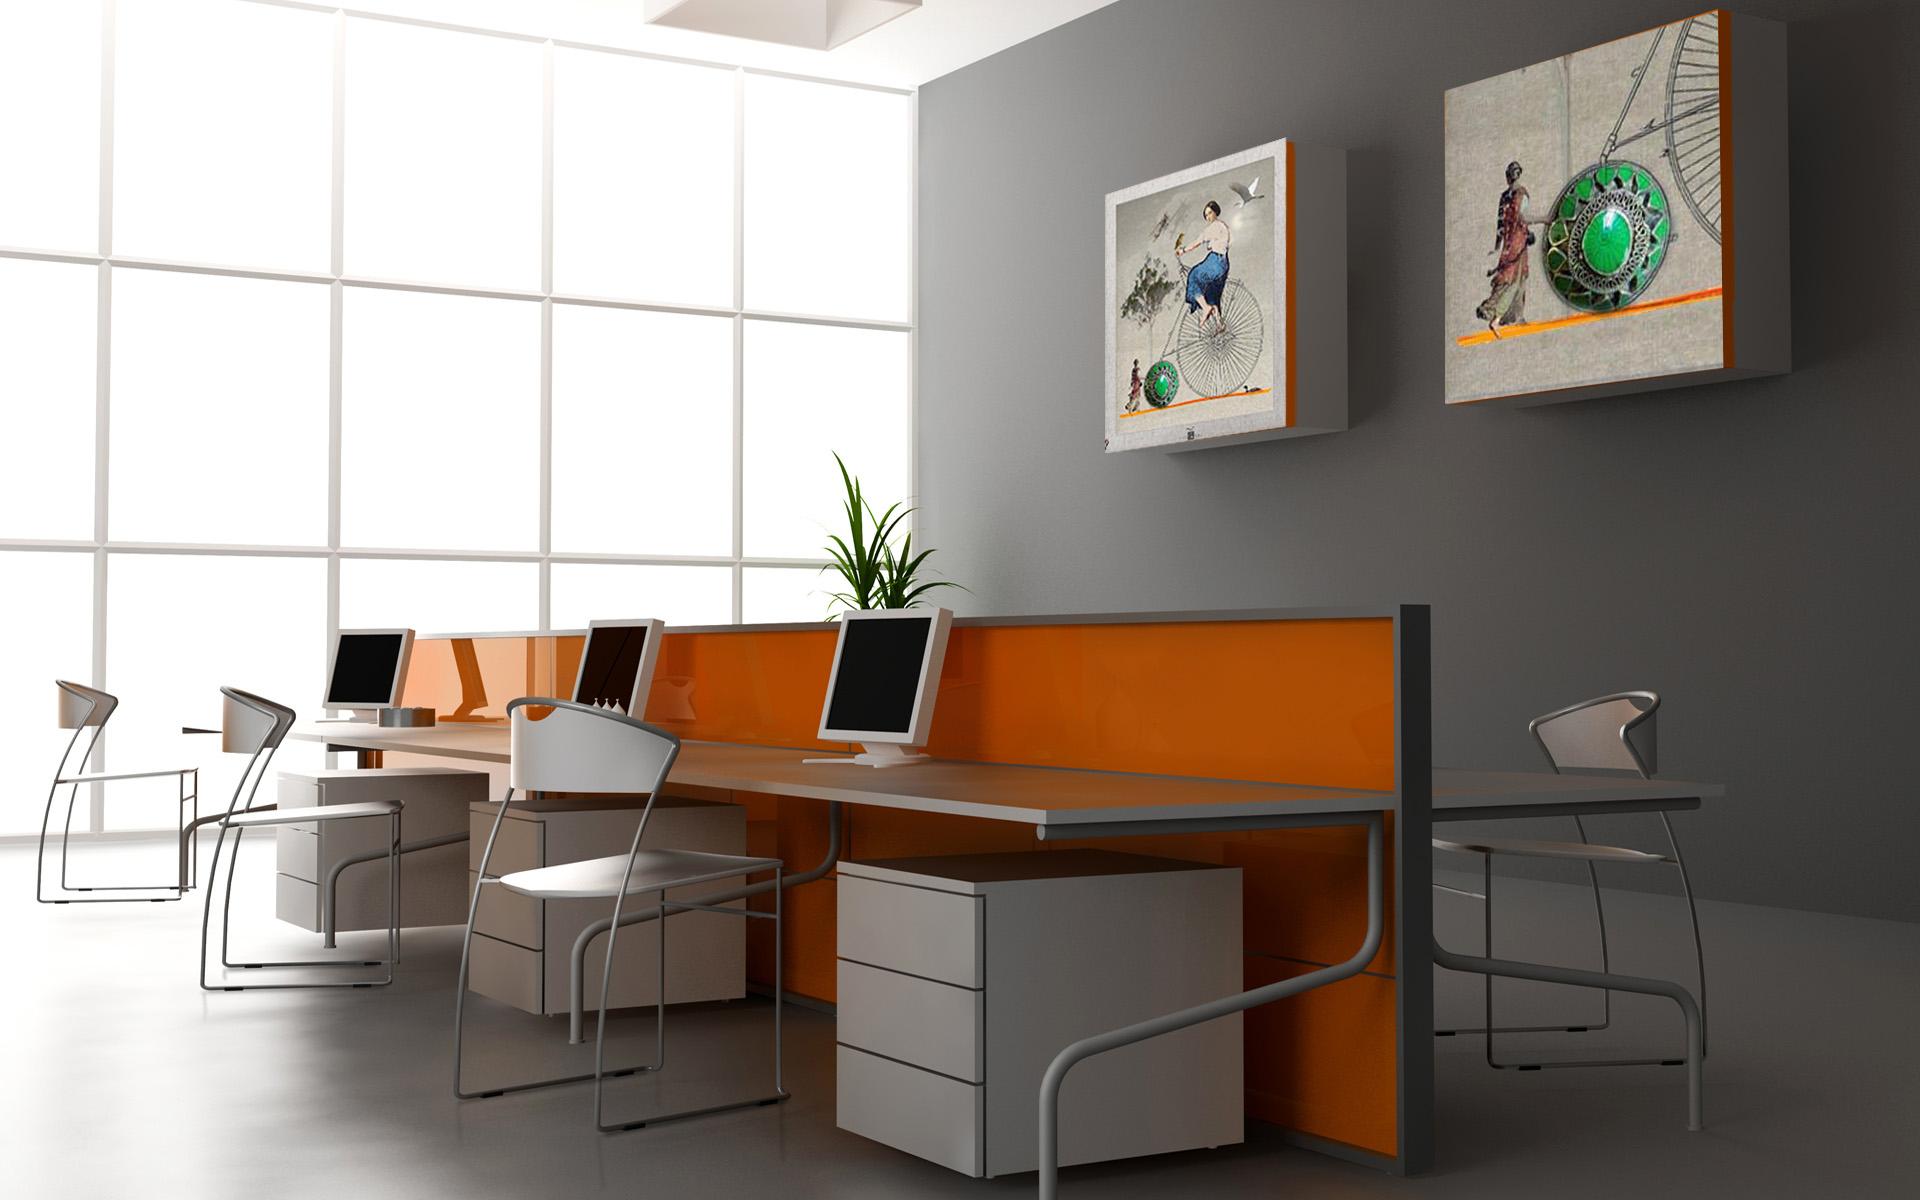 Office-Interior-Concept-Design.jpg